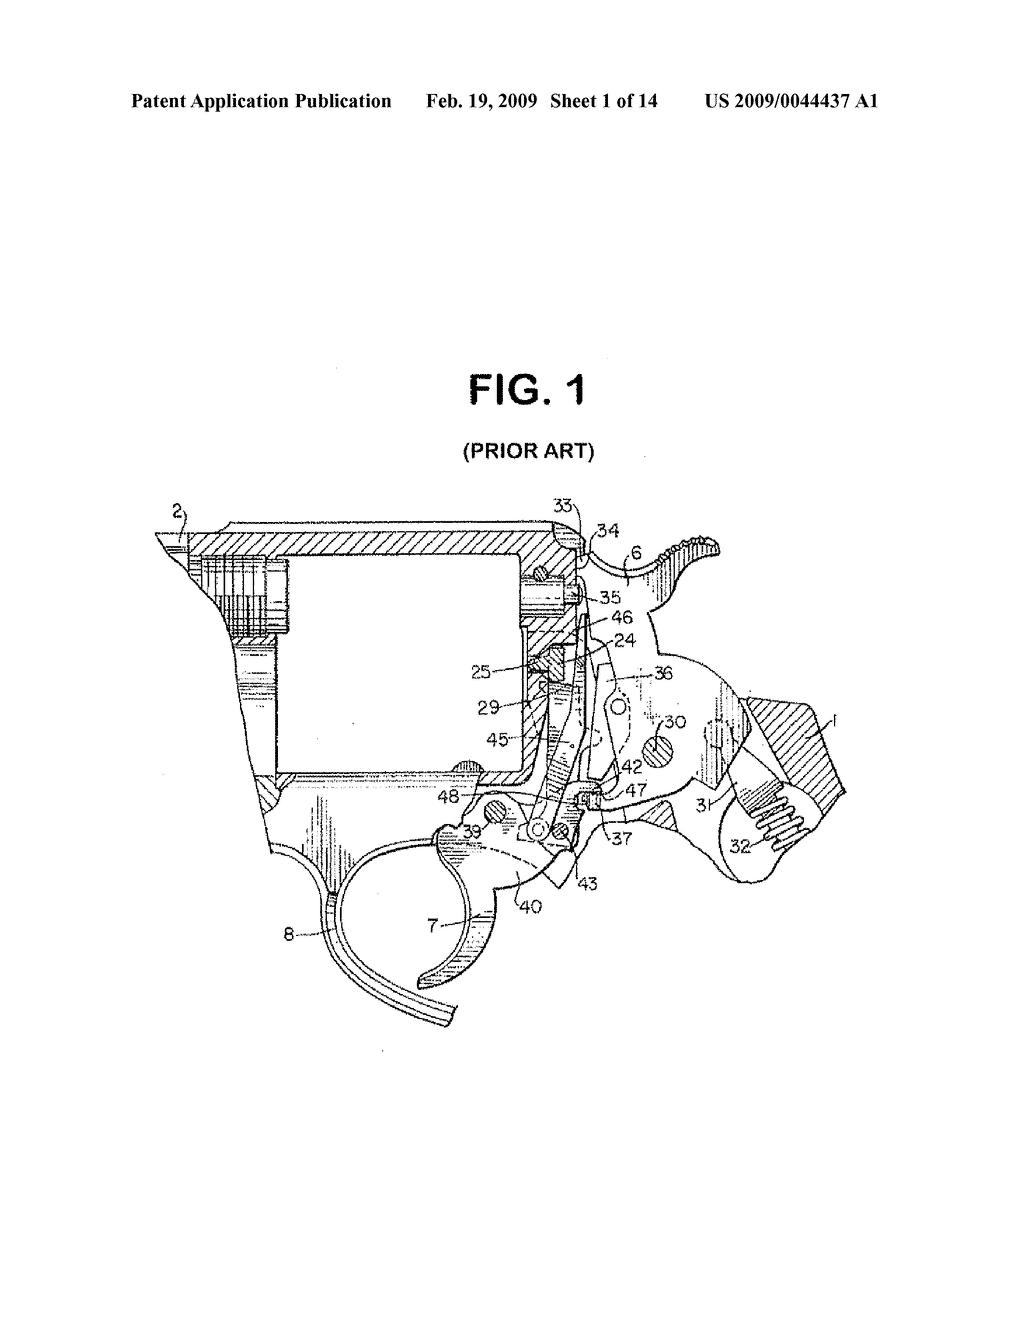 revolver trigger mechanism diagram schematic and image 02 [ 1024 x 1320 Pixel ]